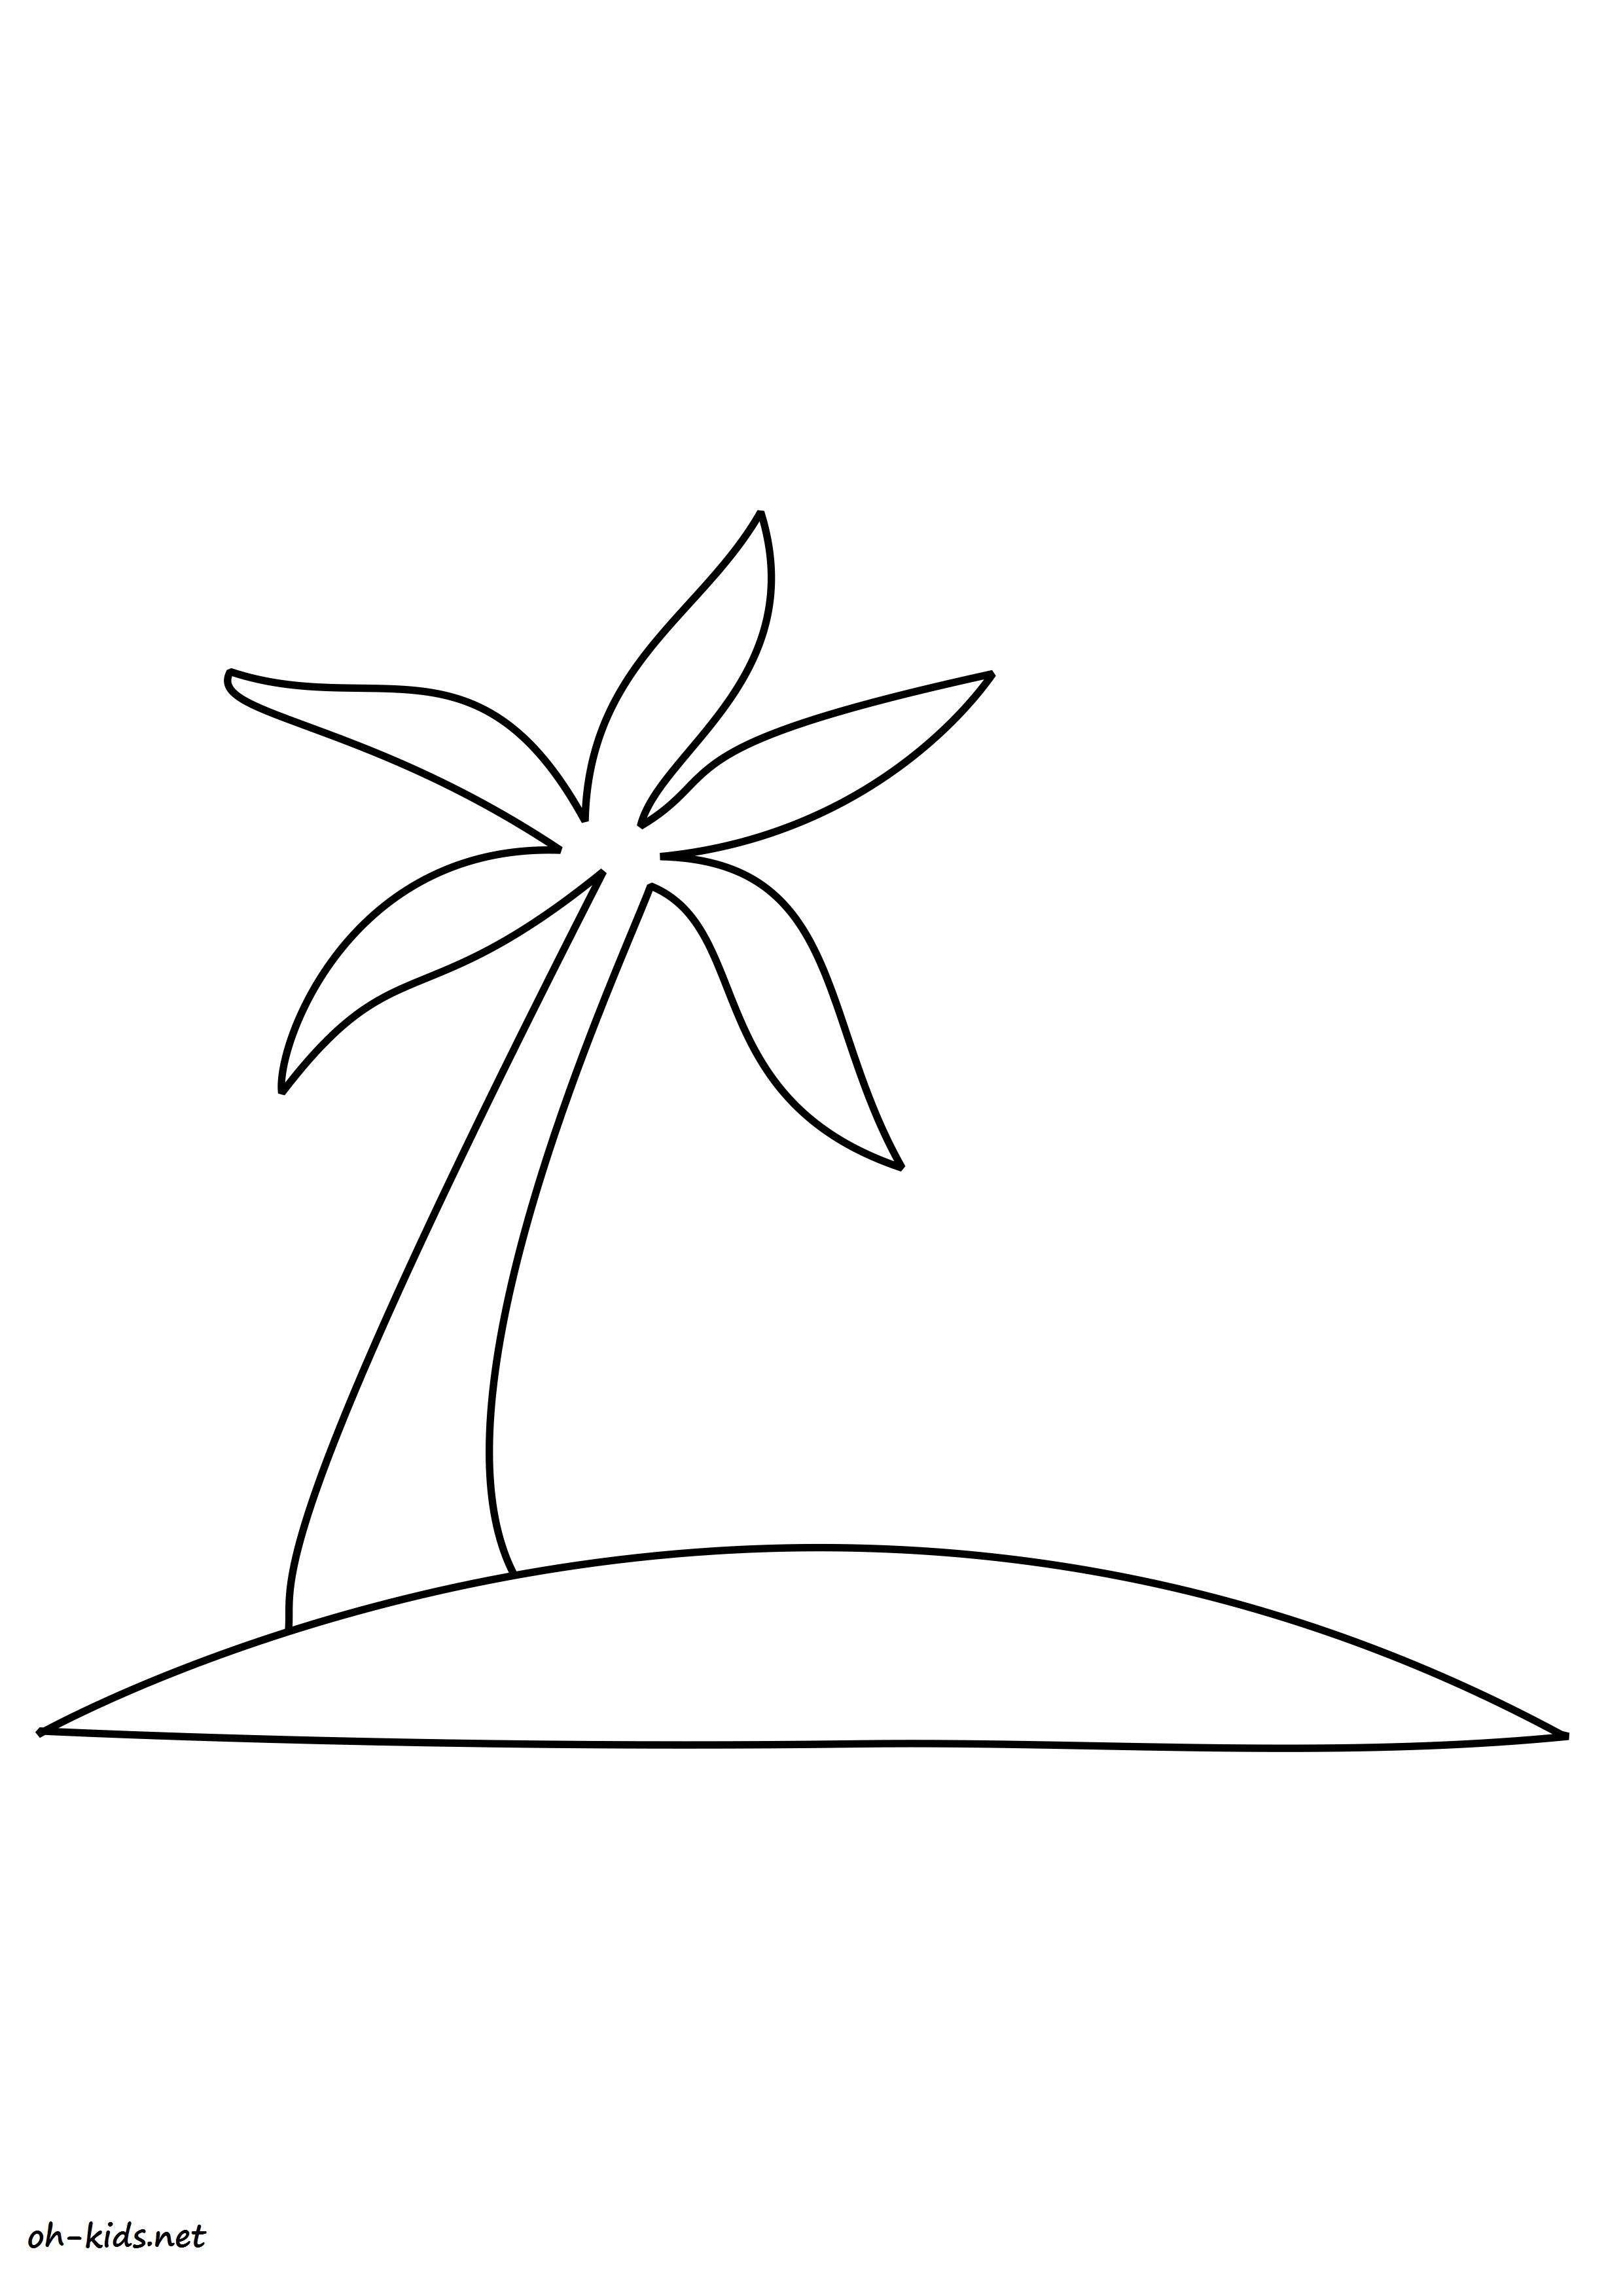 Dessin de plage a imprimer - Dessin #1461